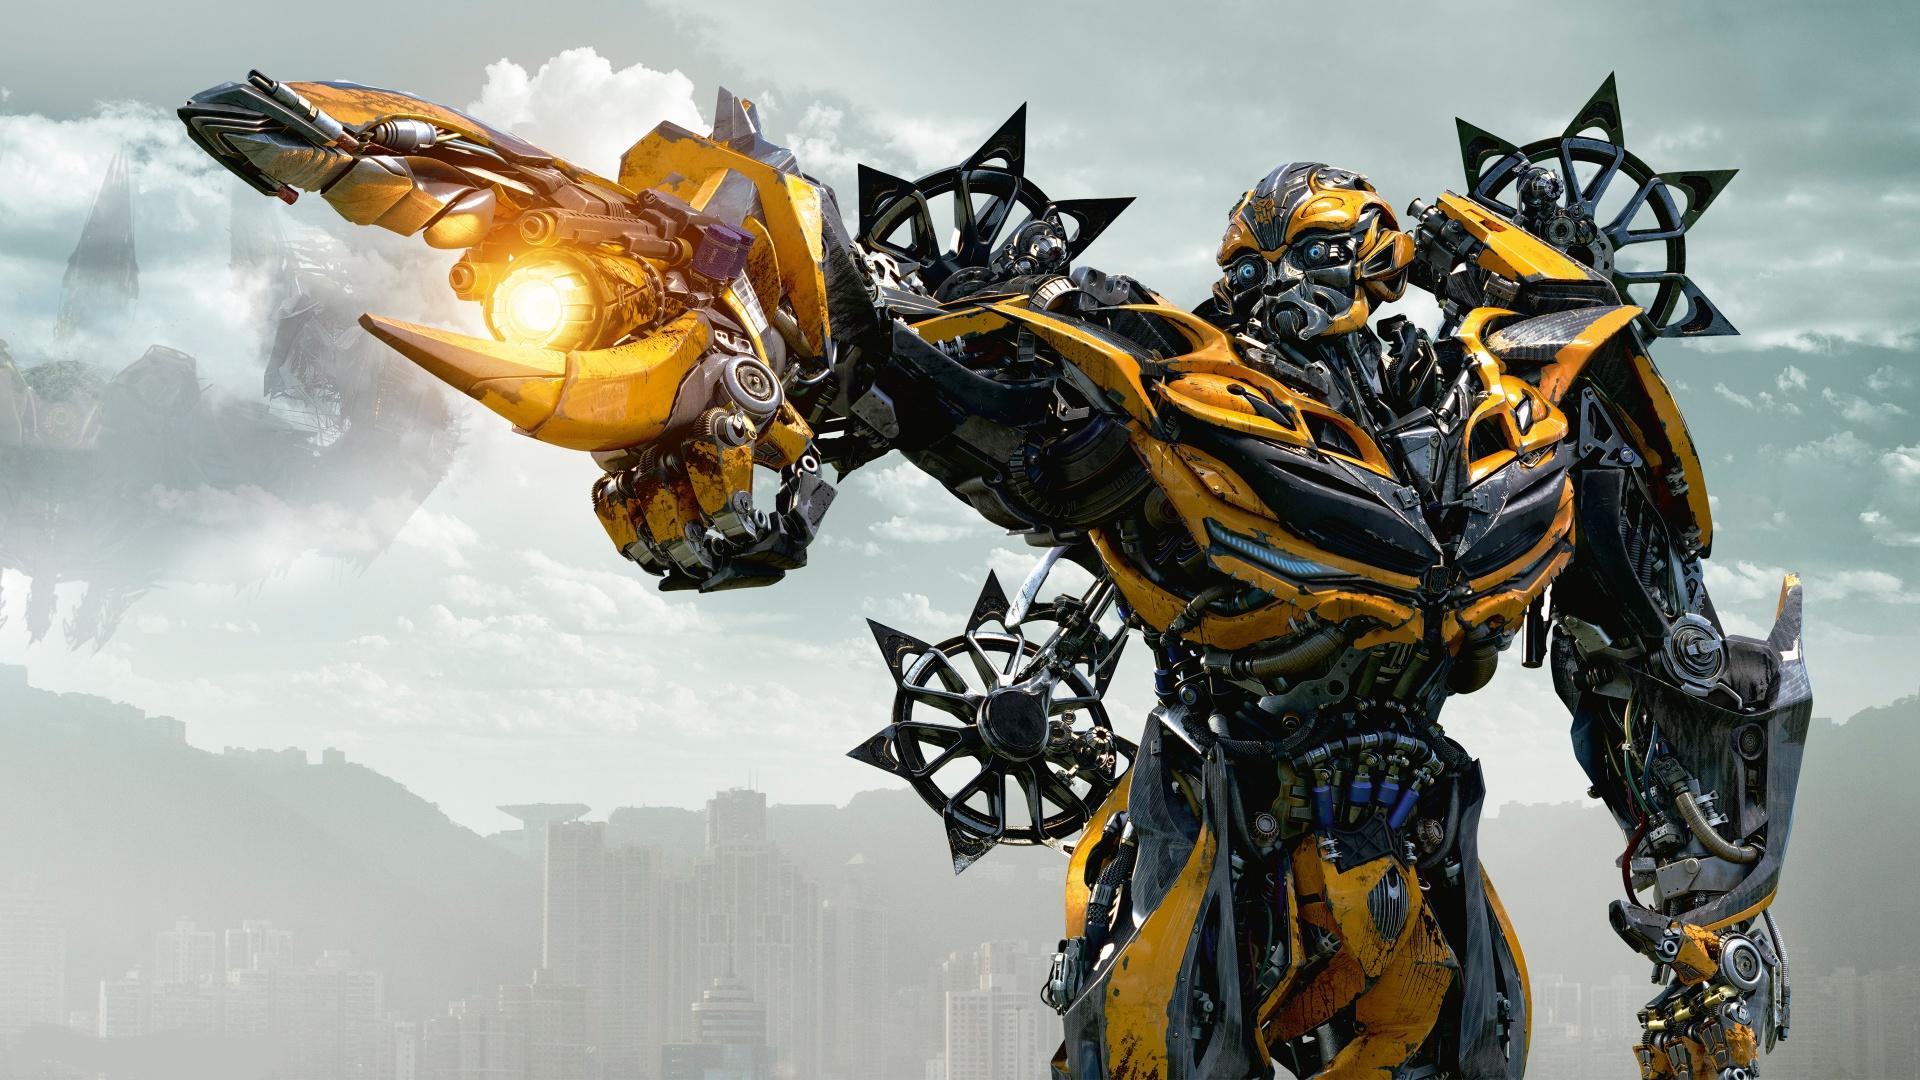 Bumblebee 3d Autobots Transformers Hd Wallpaper 1920x1080